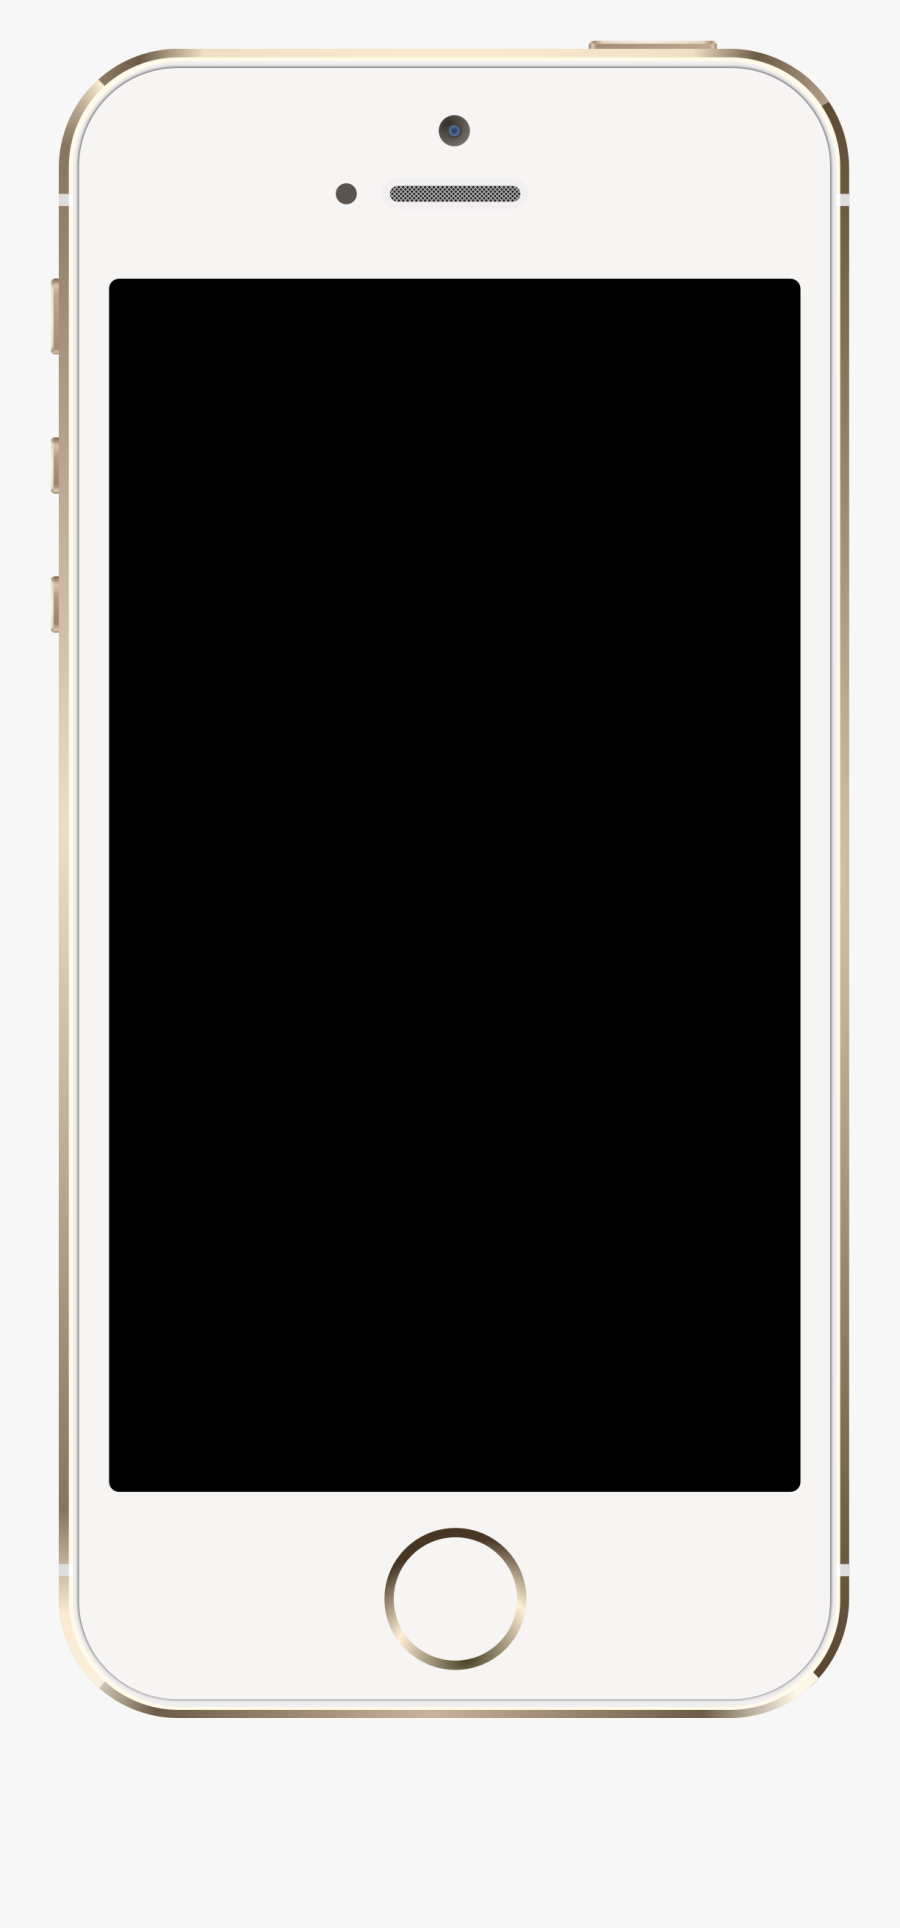 Iphone 5s Clip Art Gallery - Ipad Air Mockup Png, Transparent Clipart